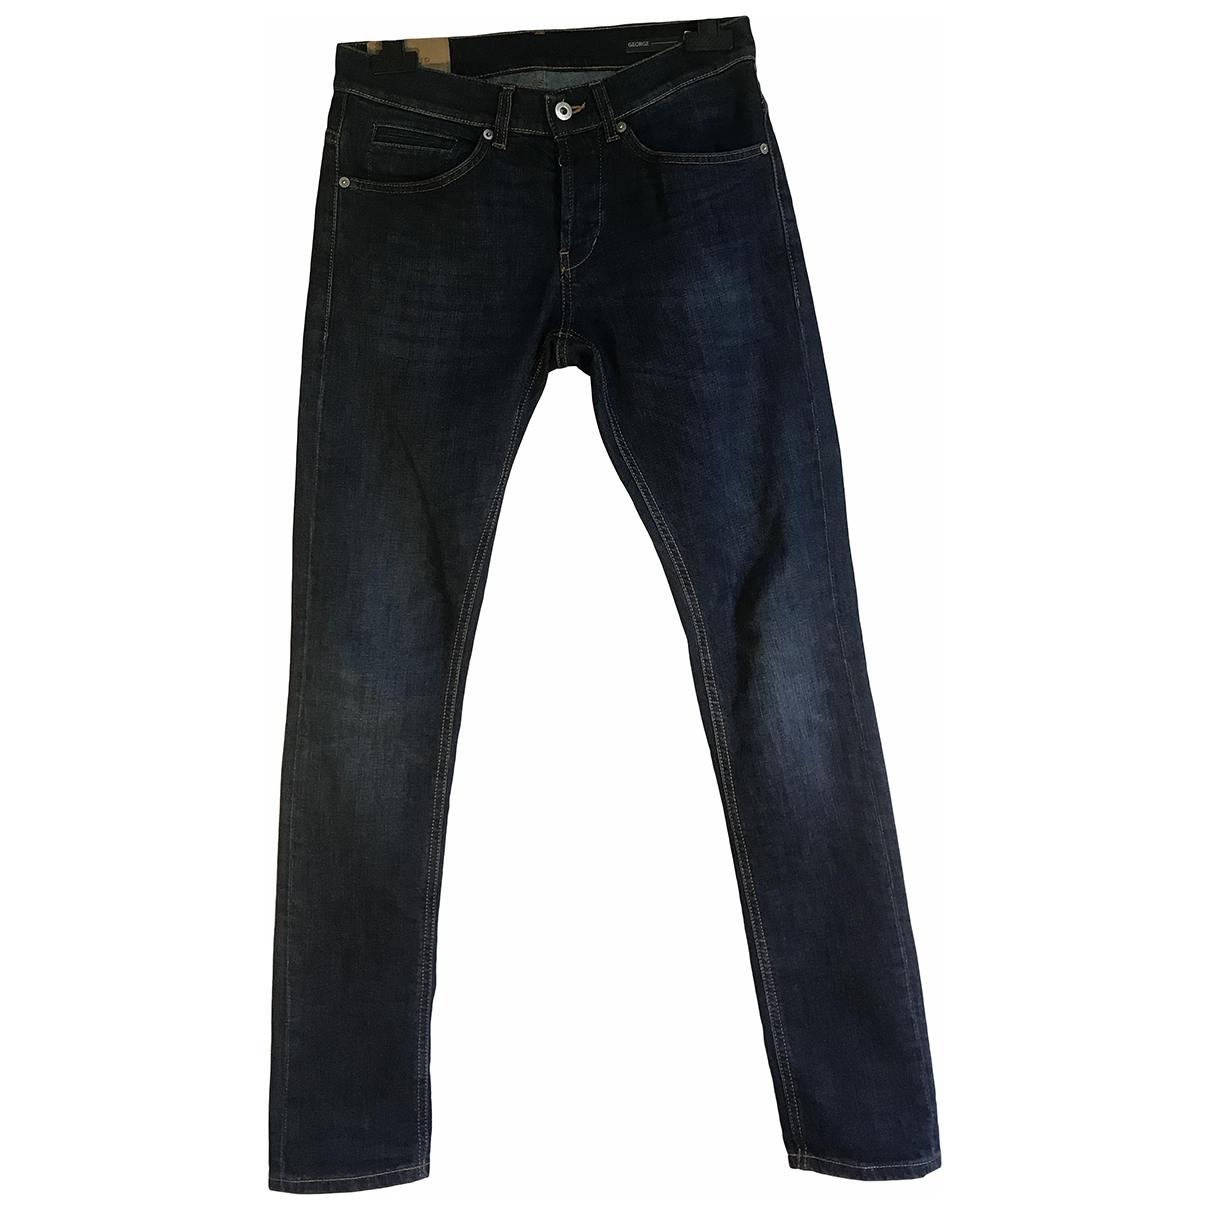 Dondup \N Blue Cotton - elasthane Jeans for Men 30 US